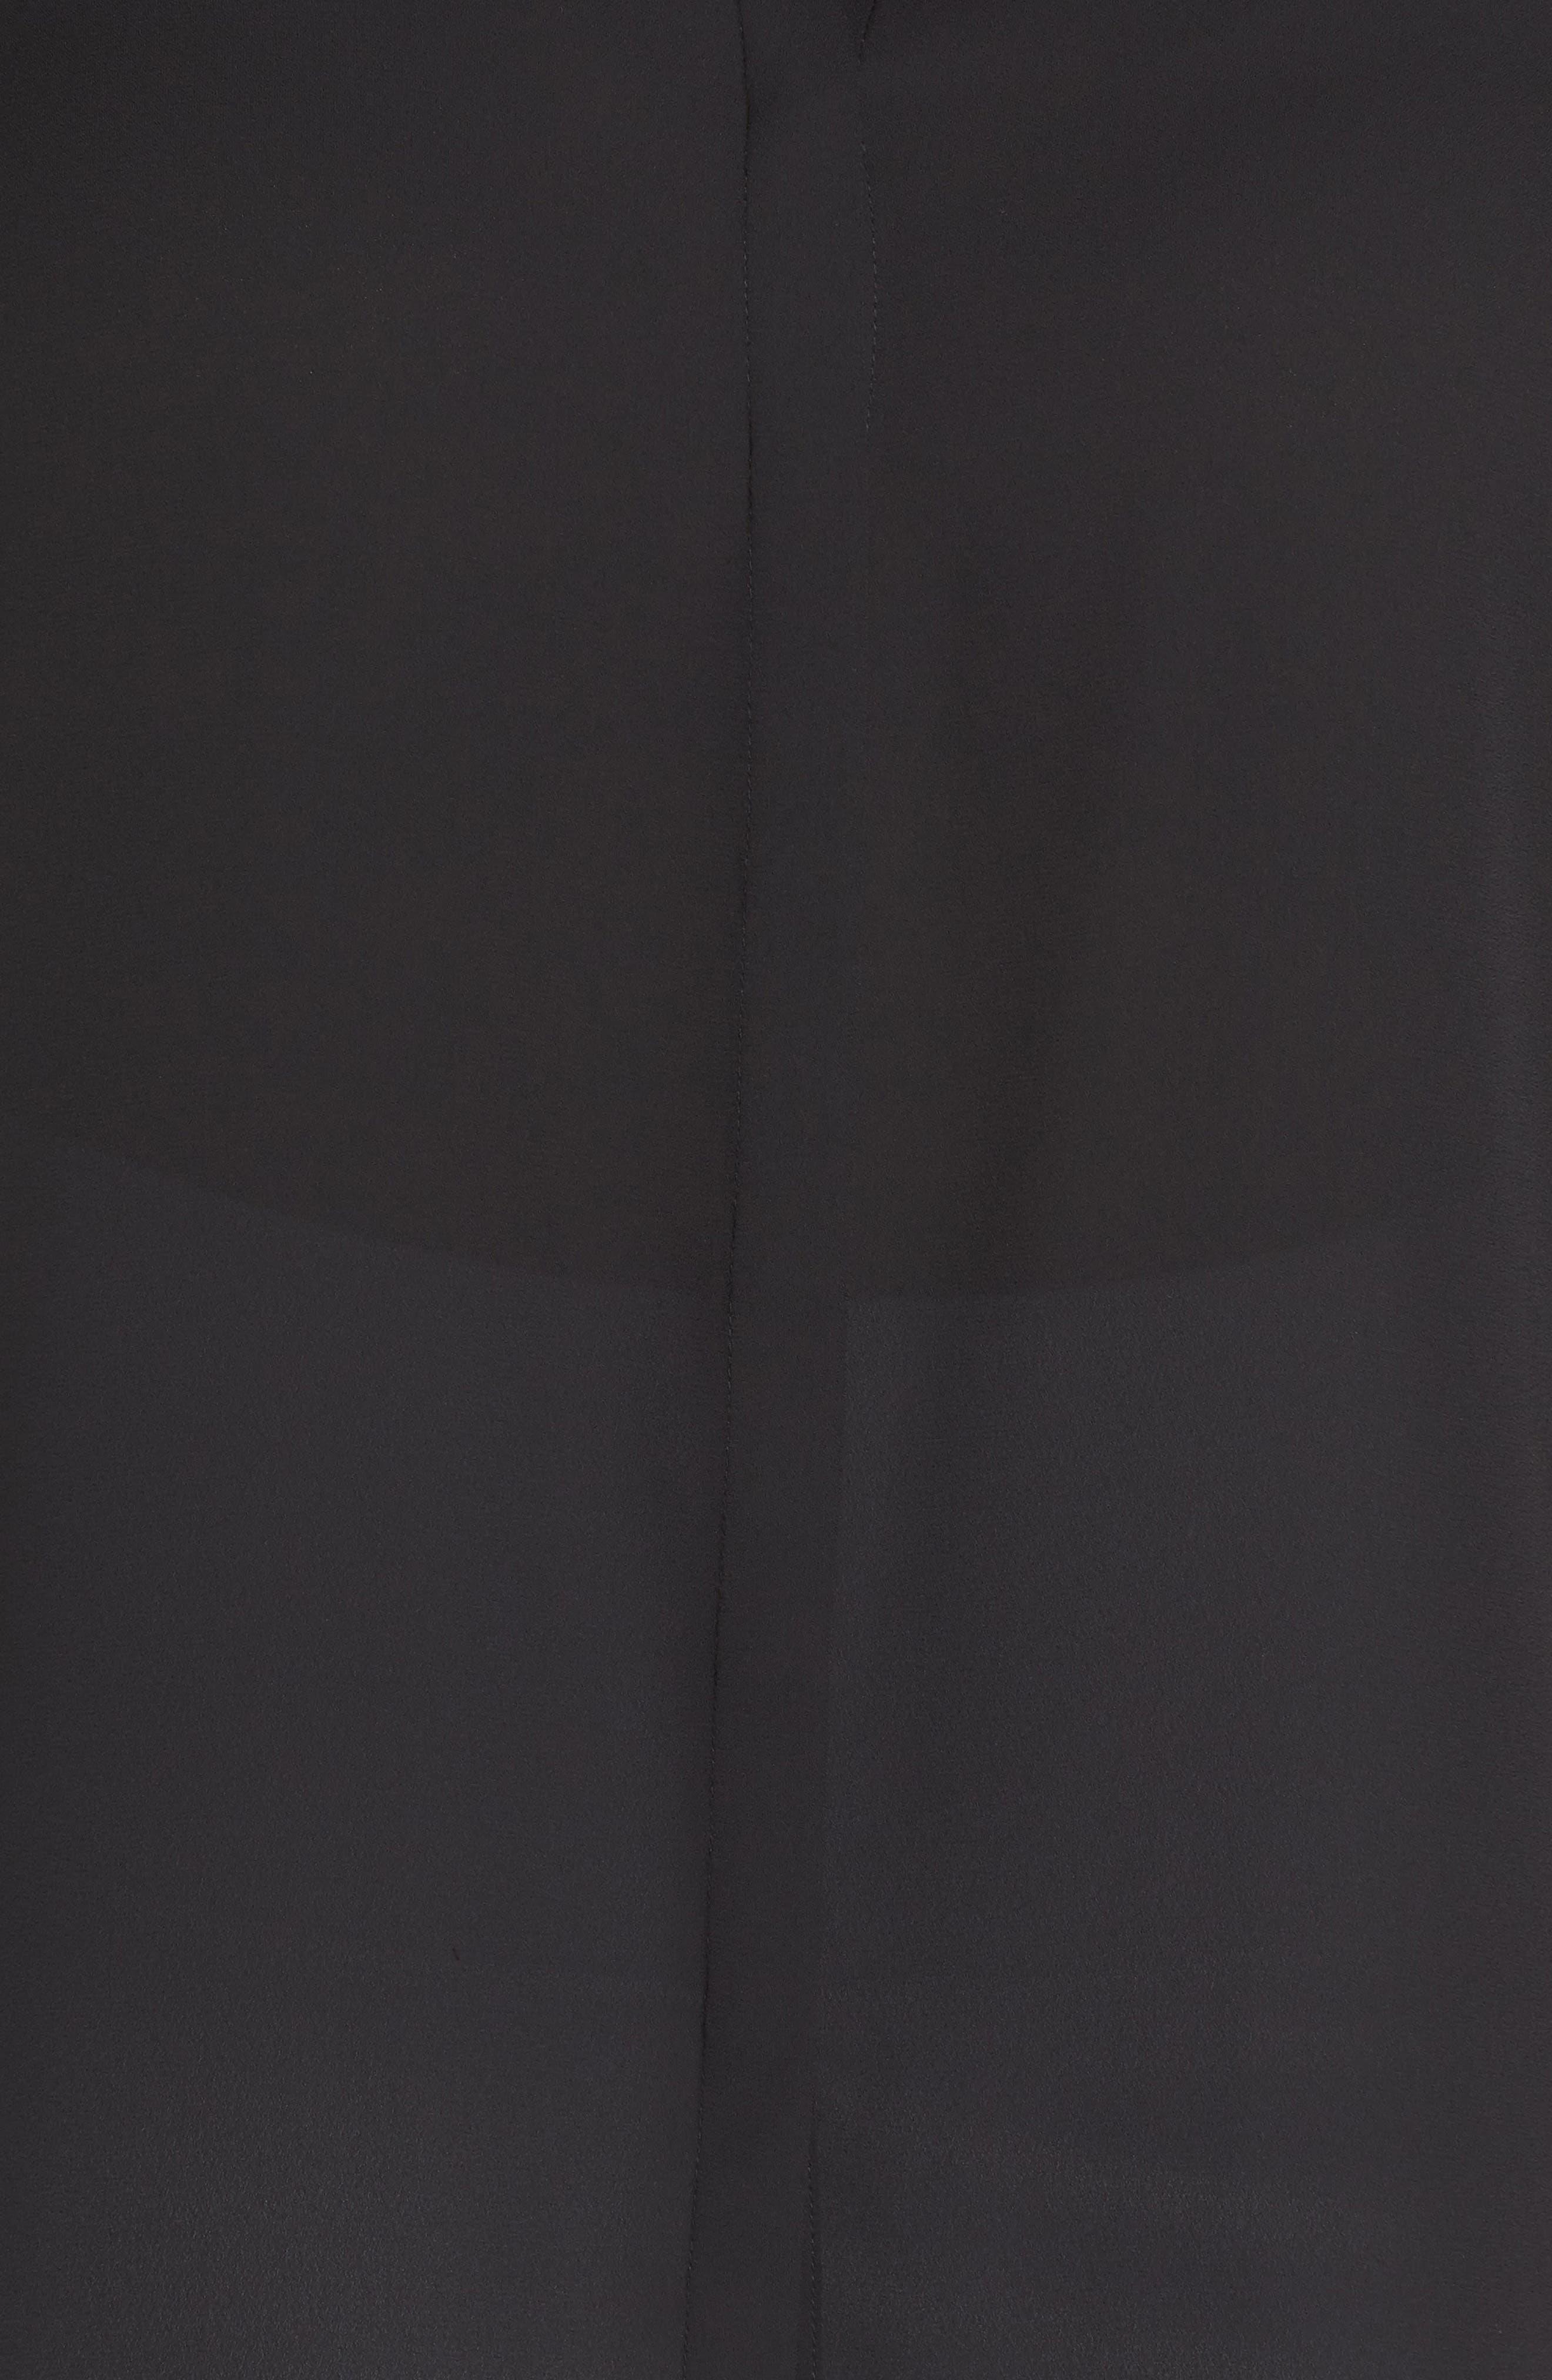 Flutter Sleeve Top,                             Alternate thumbnail 6, color,                             001